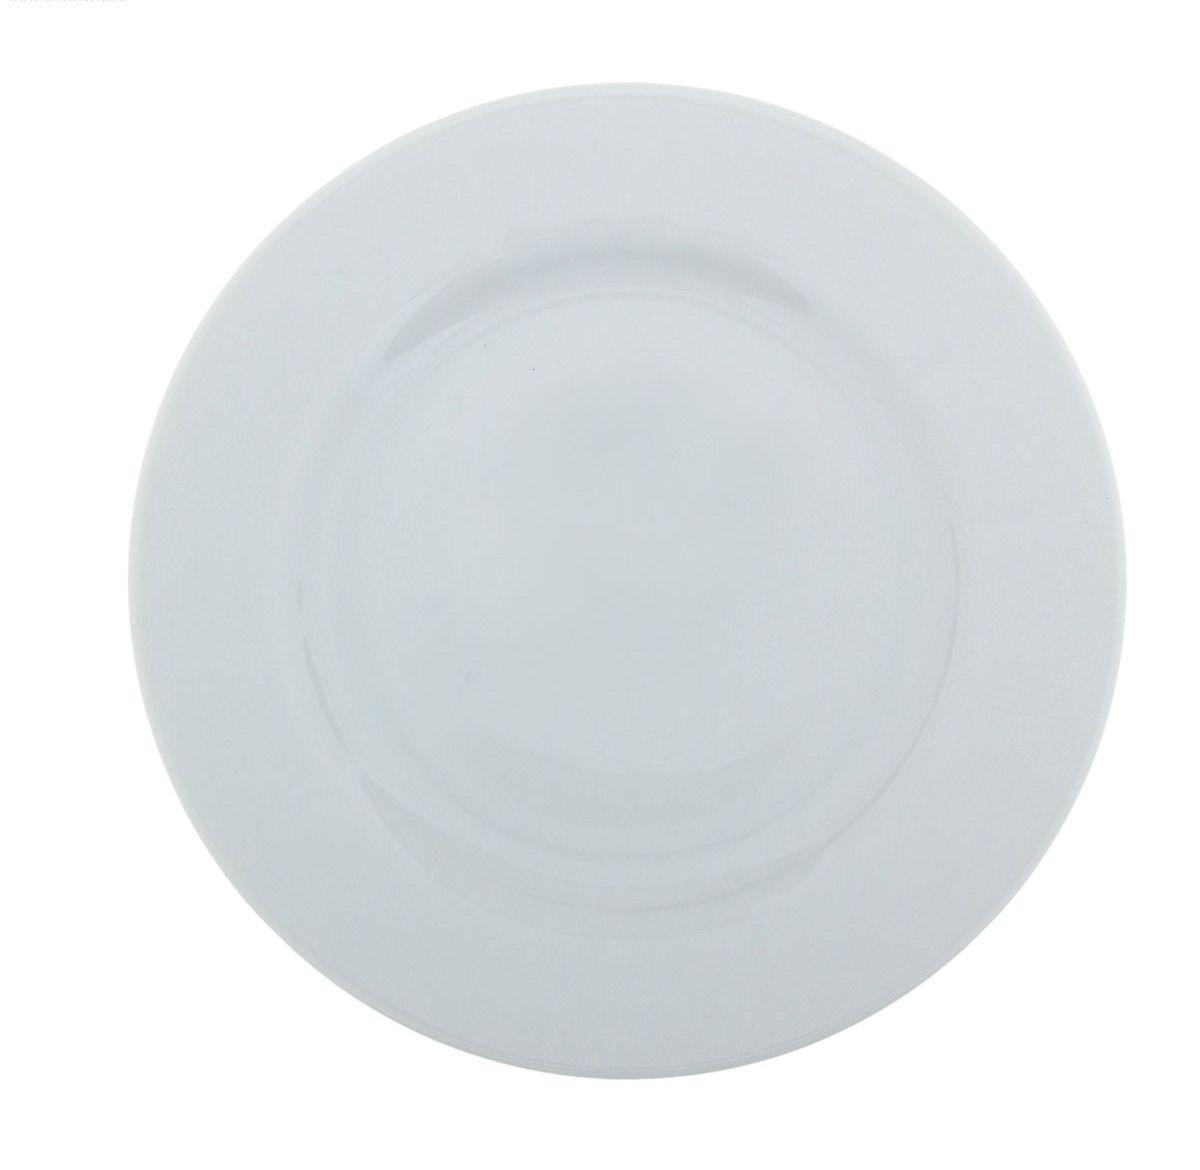 Тарелка мелкая Идиллия. Белье, диаметр 17 см507730